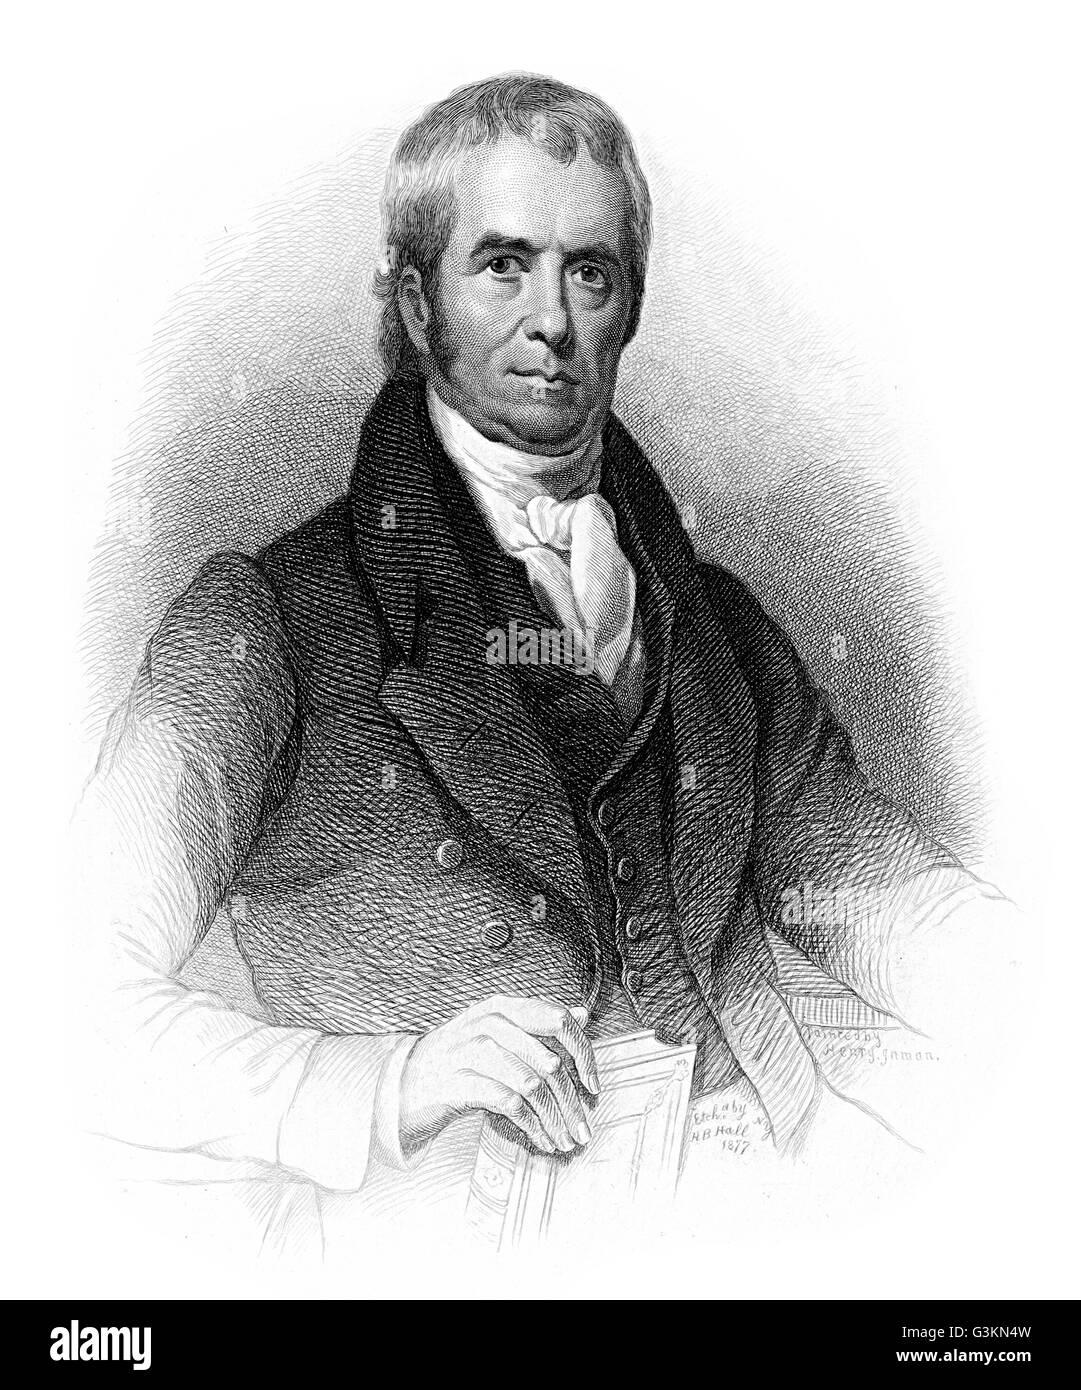 John Marshall, 1755 - 6183 - Stock Image